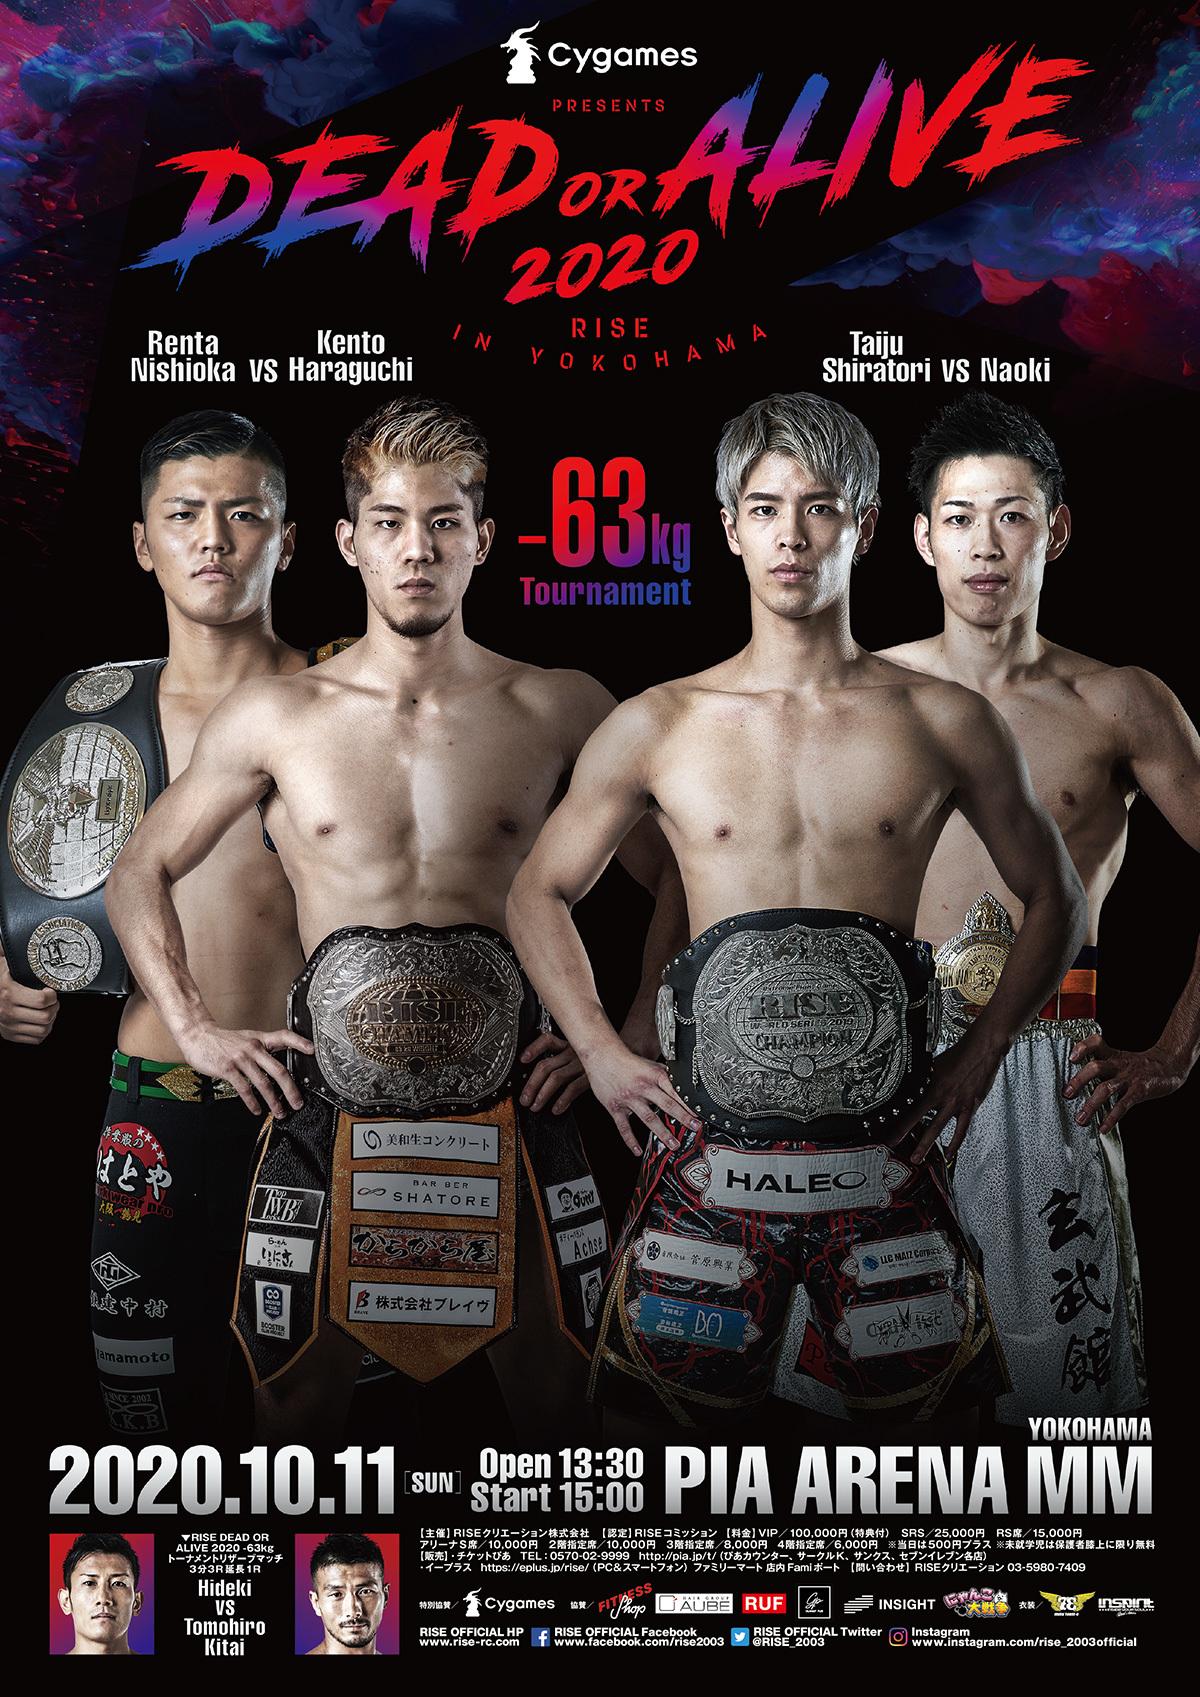 『Cygames presents RISE DEAD OR ALIVE 2020 YOKOHAMA』で-63kg級1DAYトーナメントが実施される